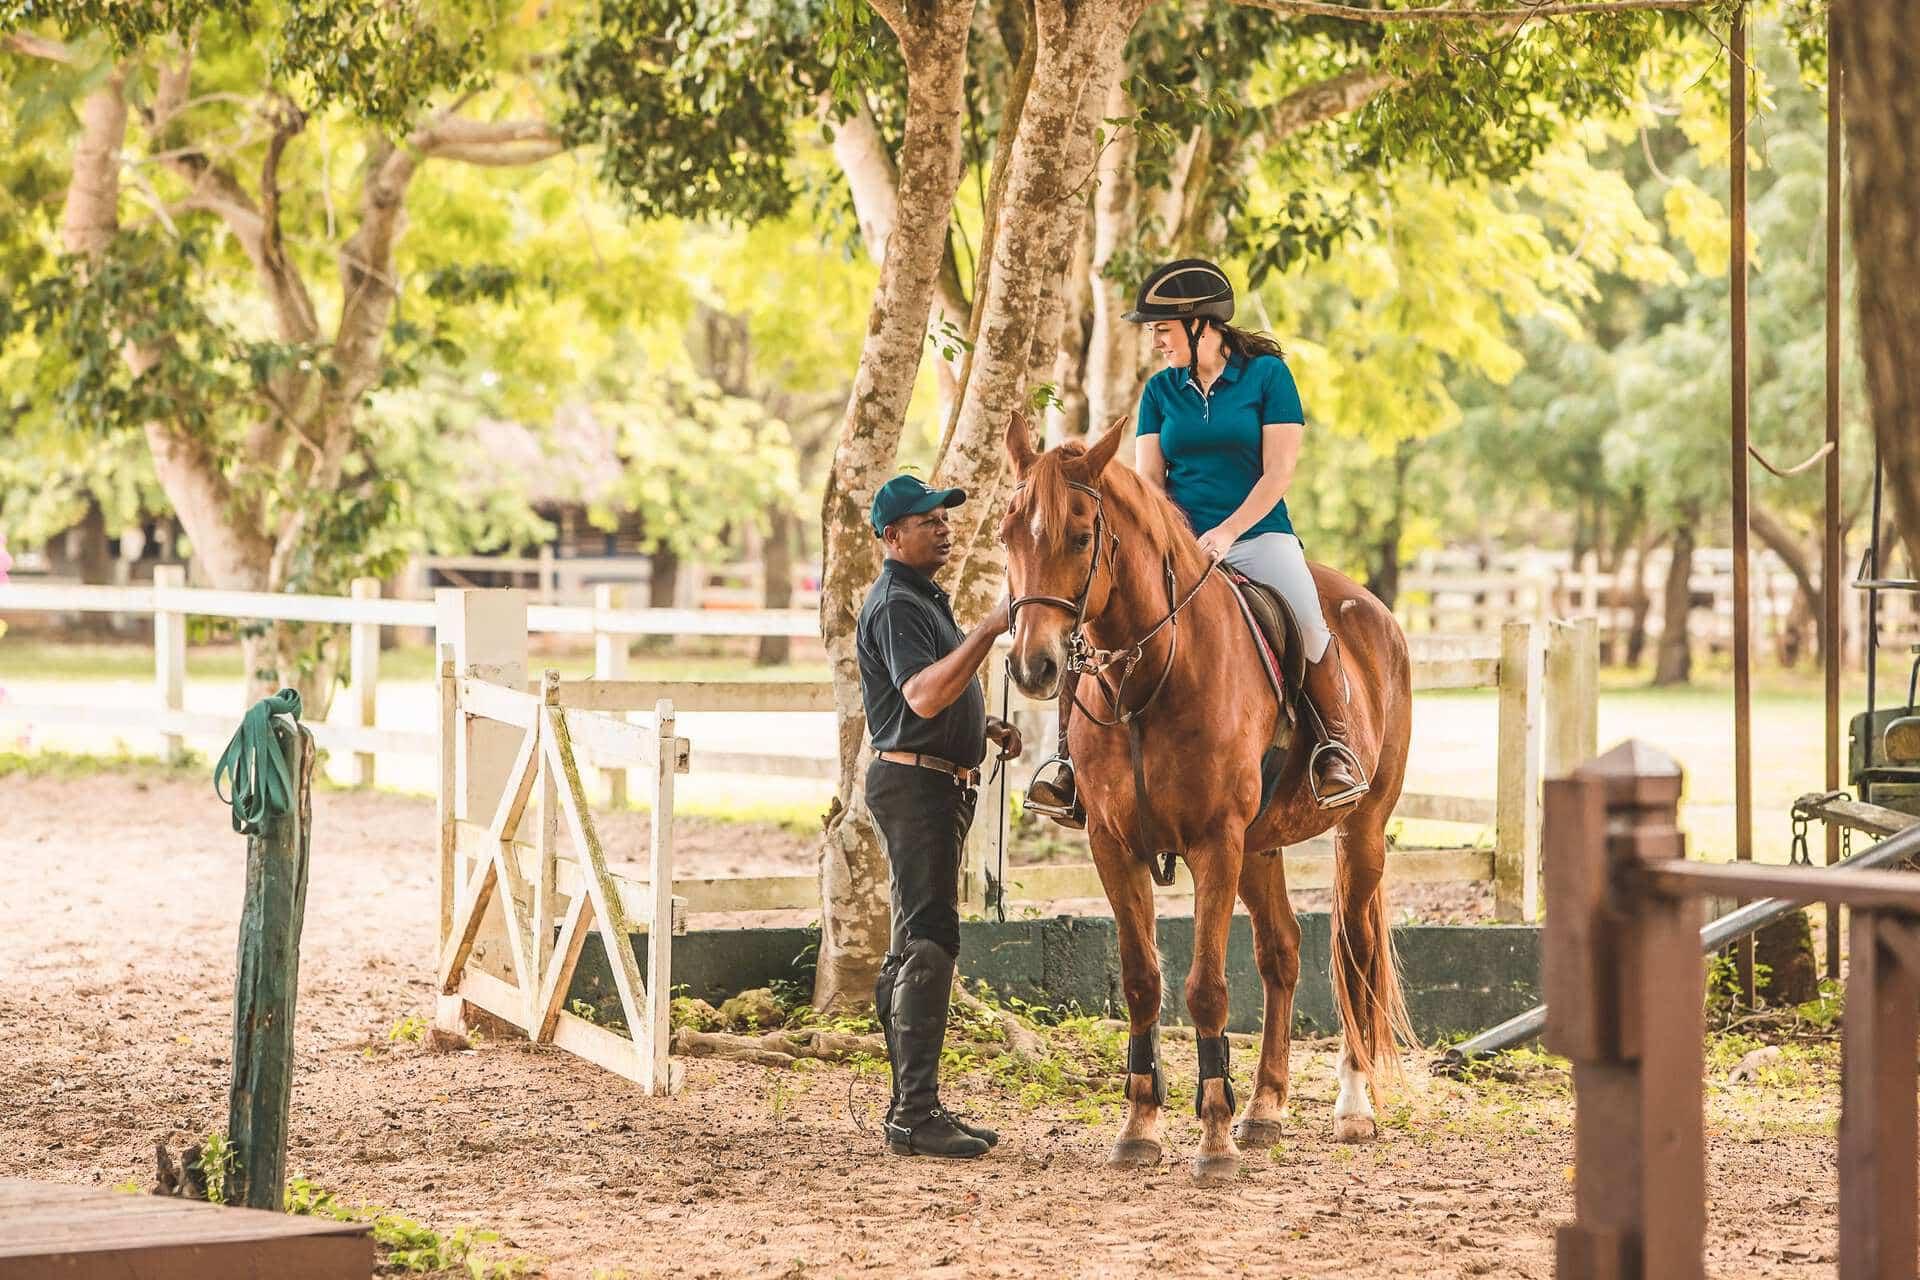 Equestrian and Horseback Riding at Casa de Campo Resort & Villas Polo Club in the Dominican Republic